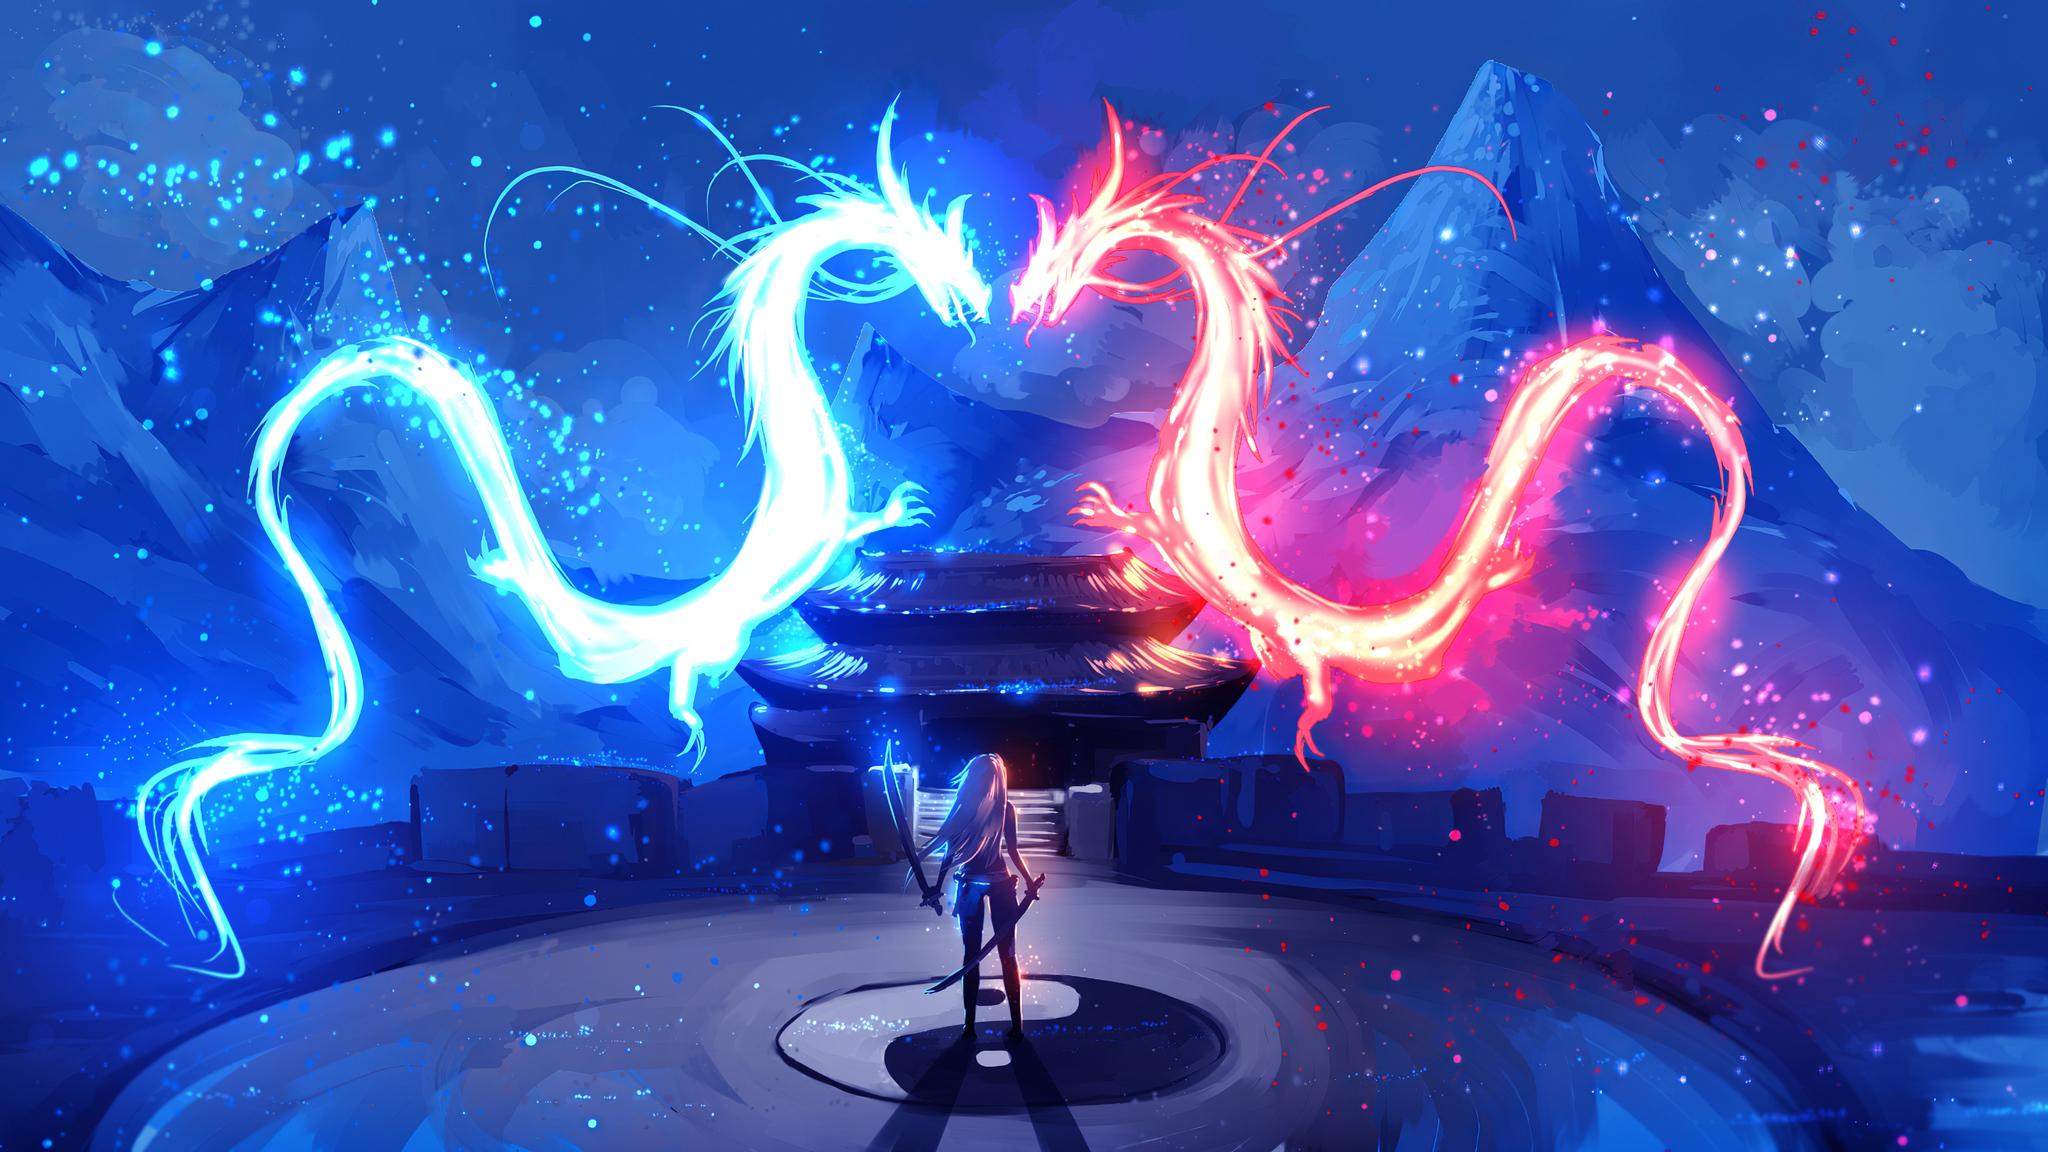 2048x1152 Dragon Red Blue Colorful Art 4k 2048x1152 ...